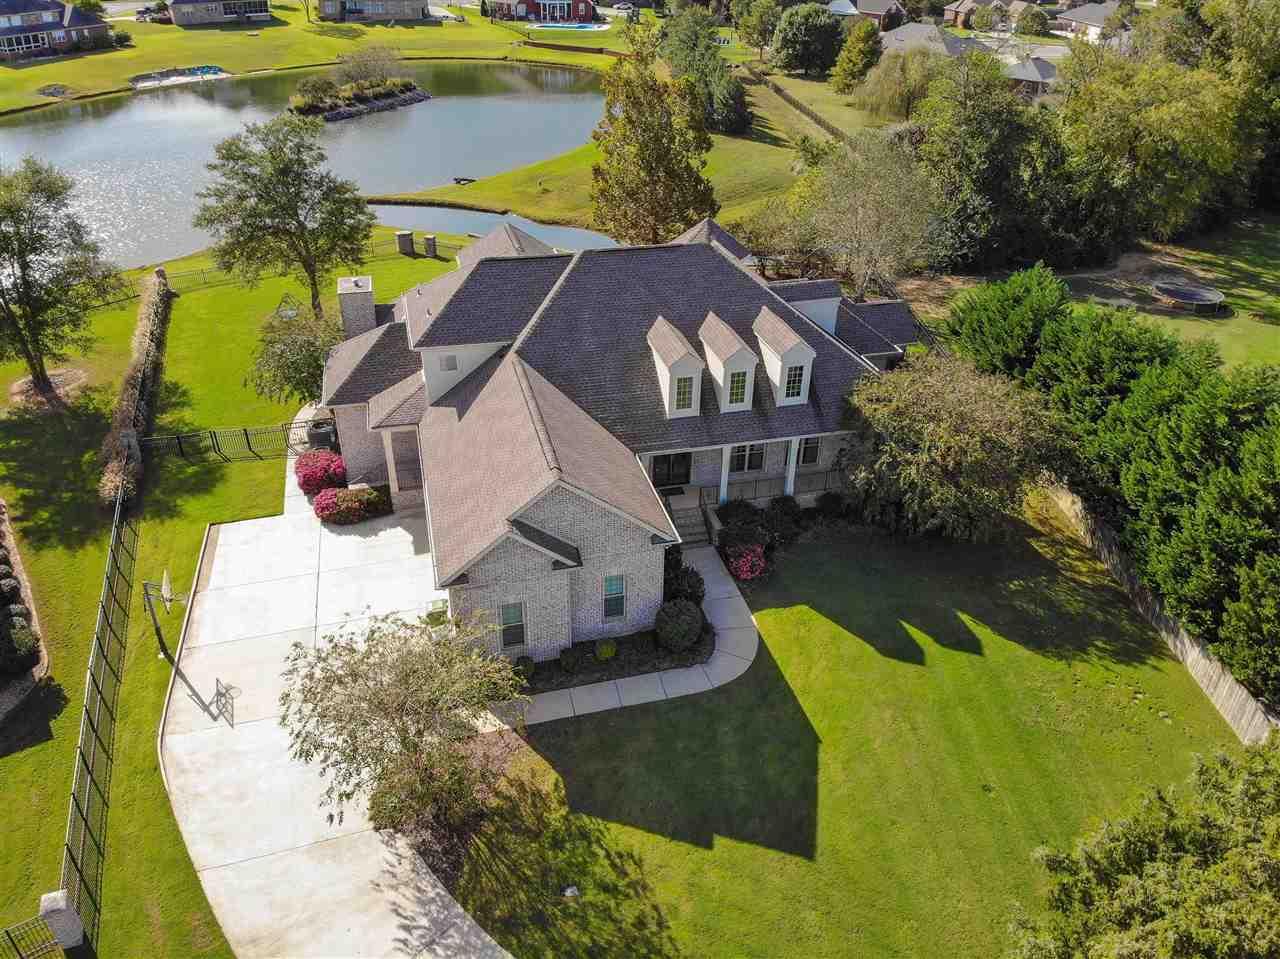 MLS# 1103636 Property Photo 1